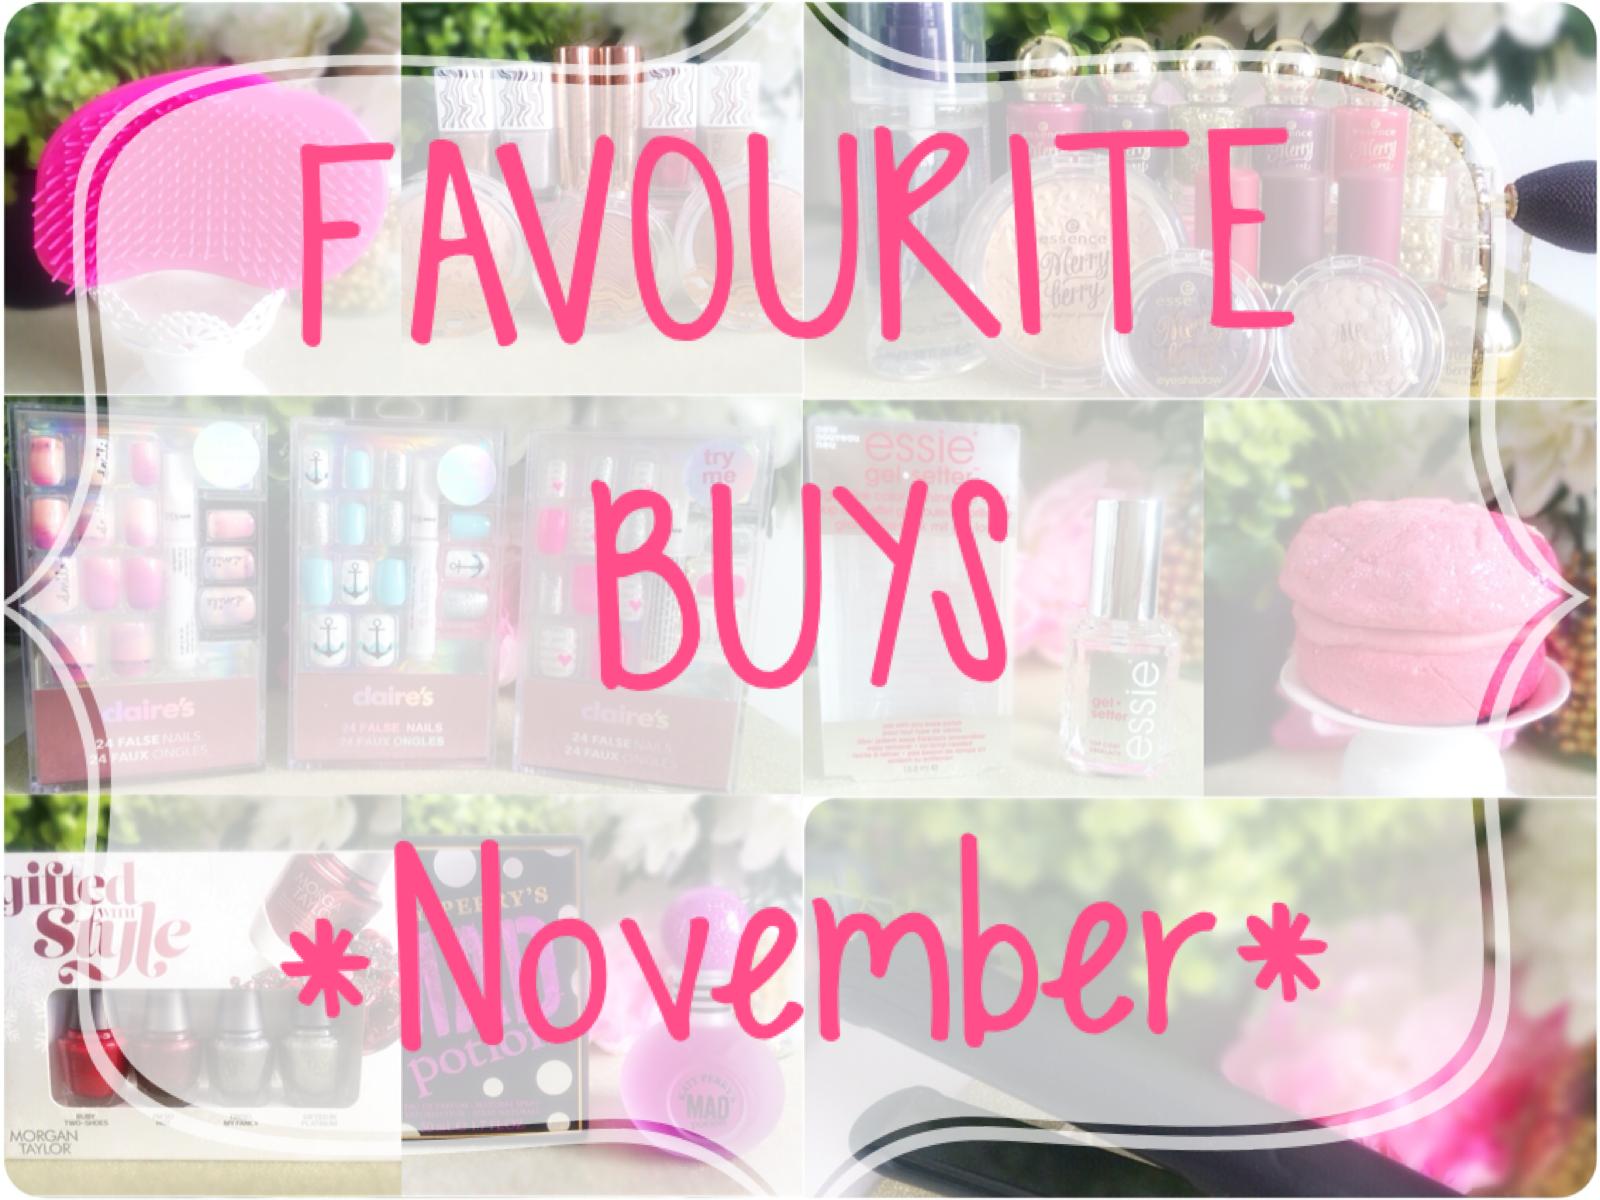 Favourite Buys November 2015 Popcorn Amp Pearls Beauty